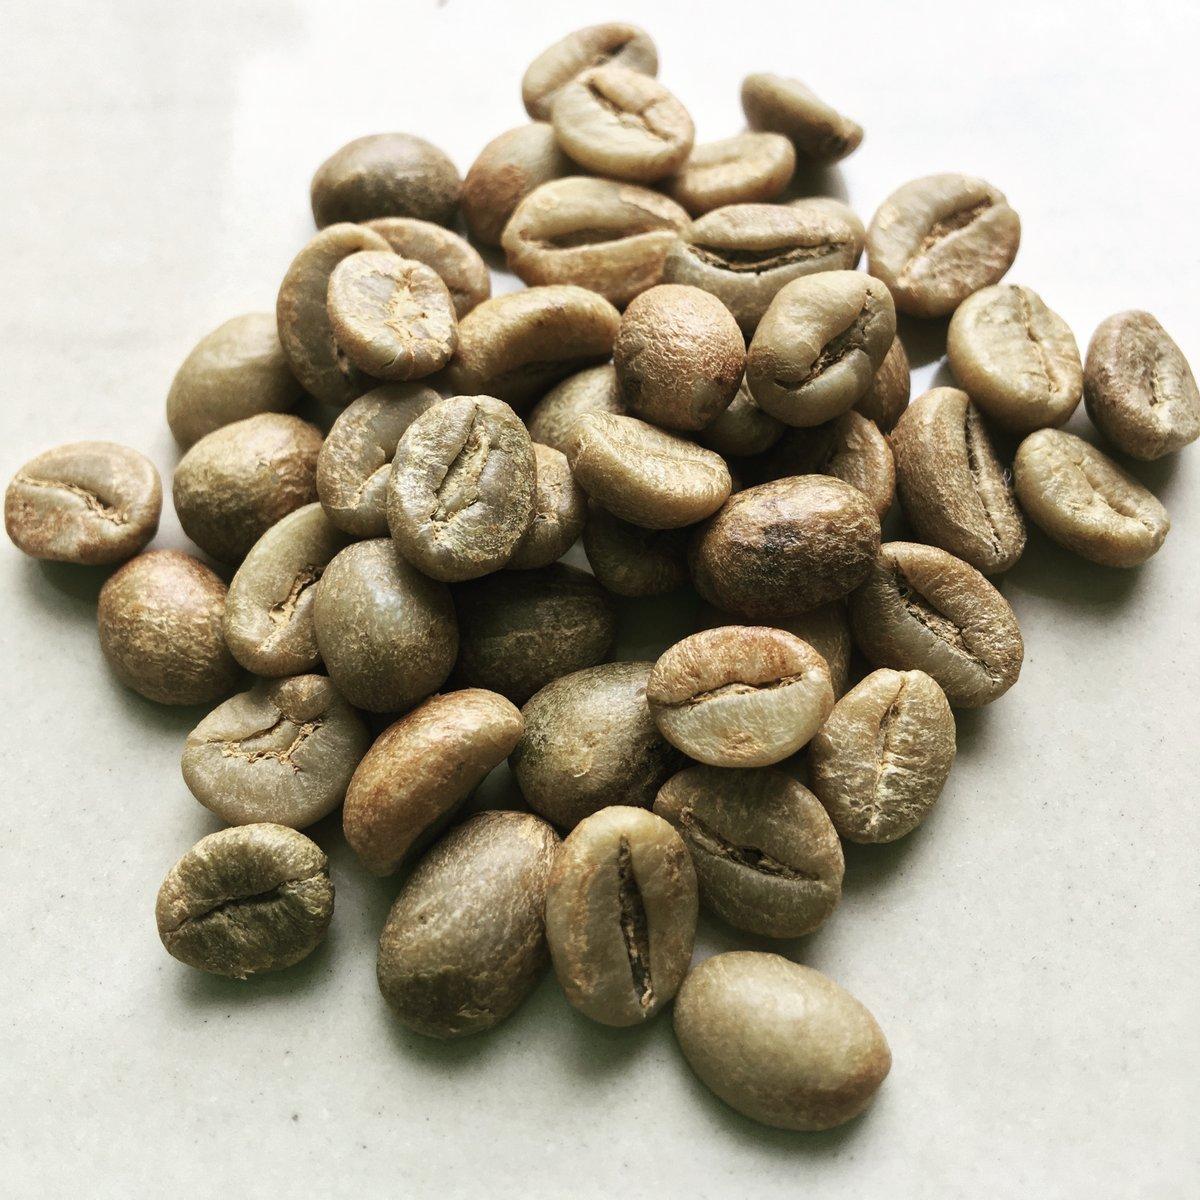 #greenbeans #coffee #coffeebeans #magelang #java #robusta #kopi #kopisme